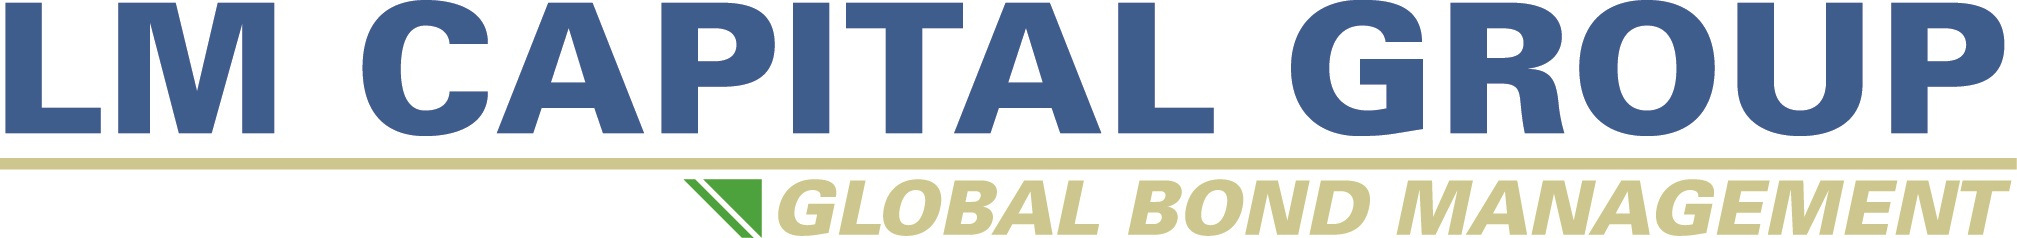 LM_Capital_Group_Logo_(CMYK).jpg